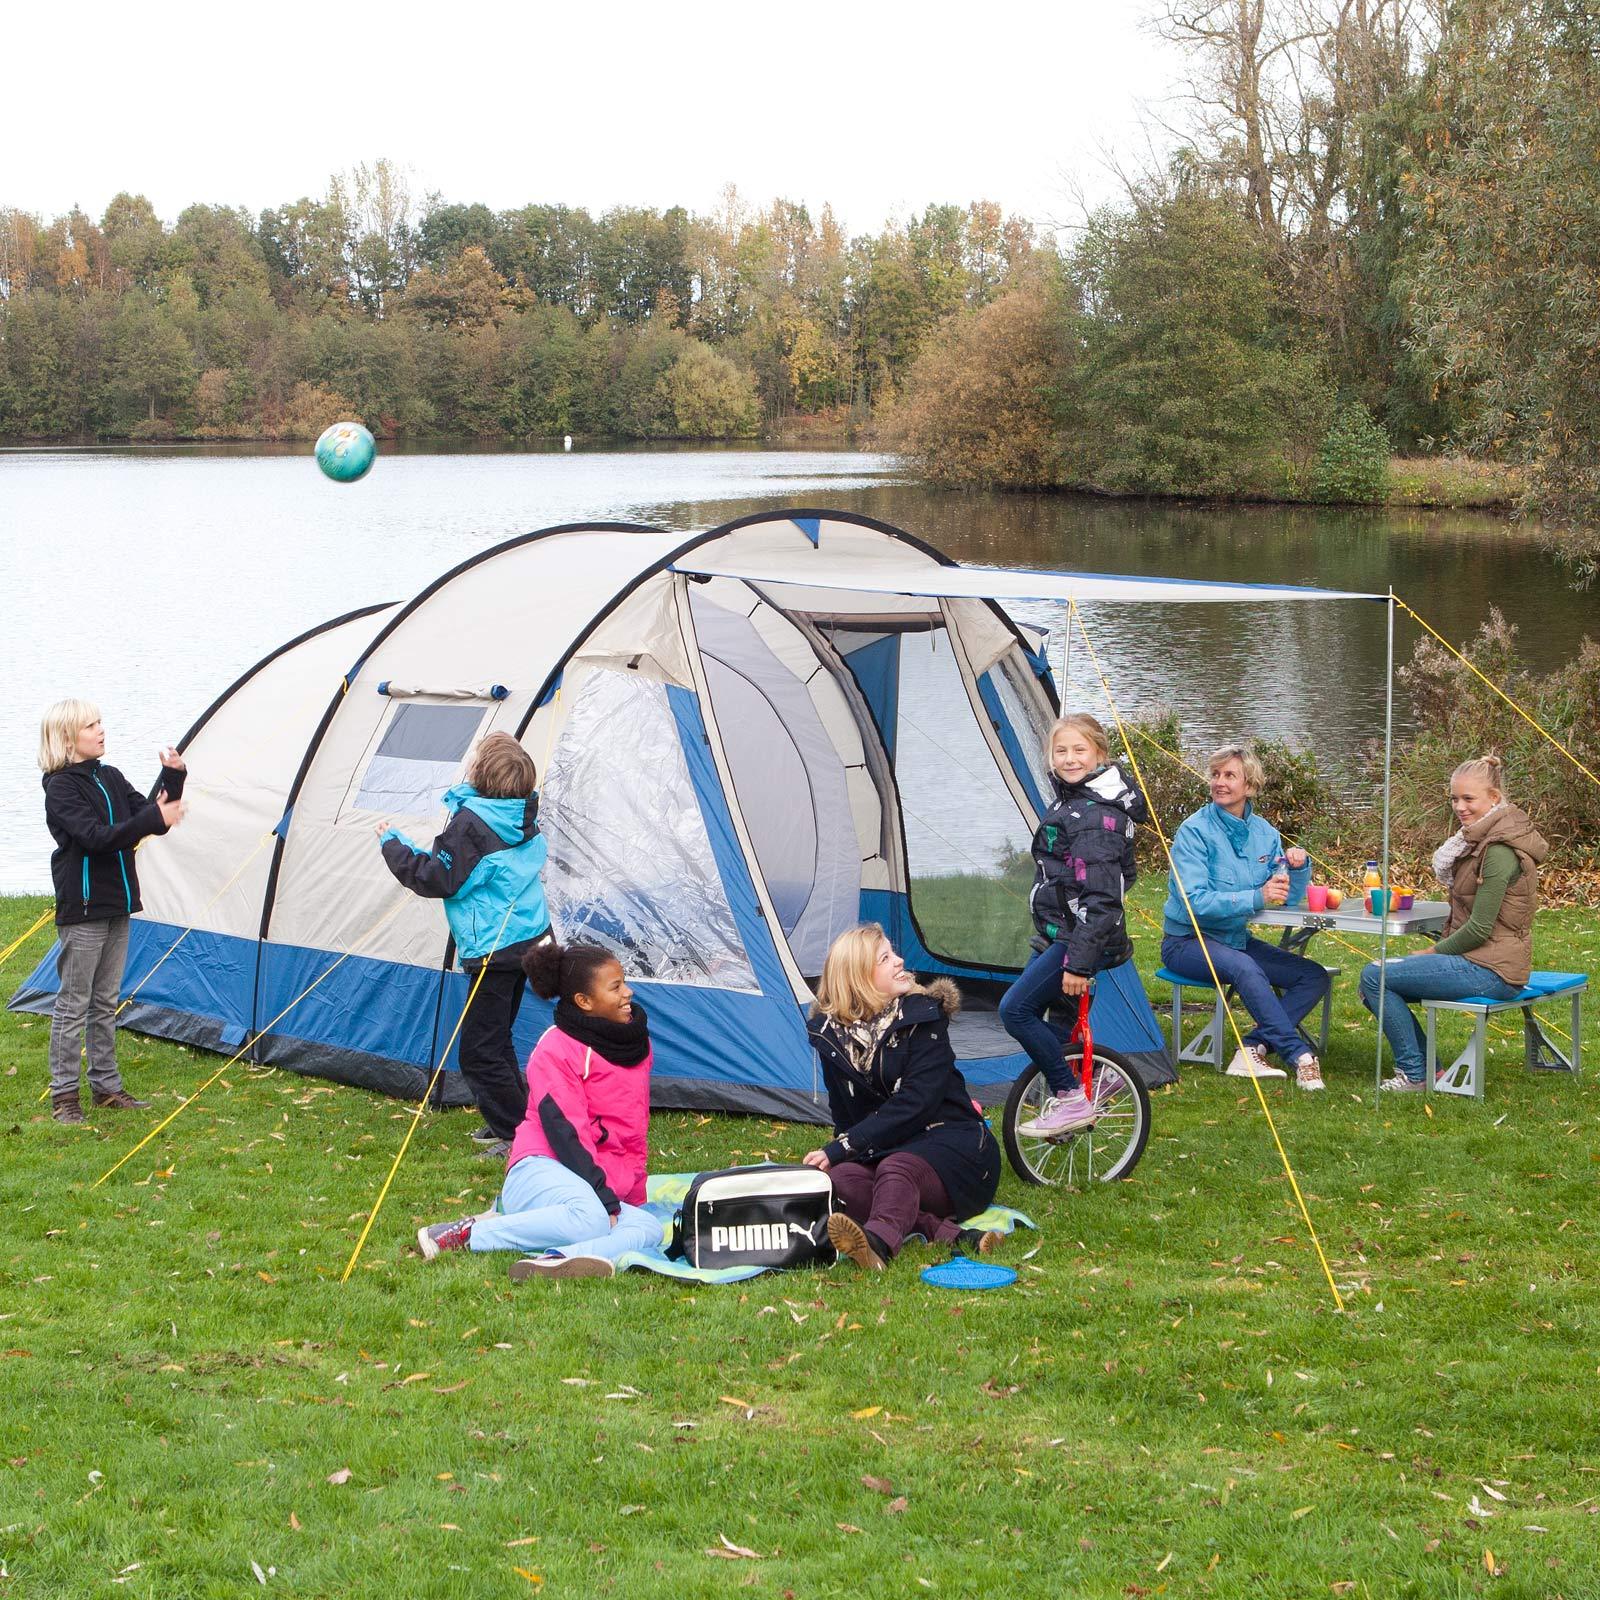 skandika lyon 5 personen familienzelt camping zelt neu ebay. Black Bedroom Furniture Sets. Home Design Ideas